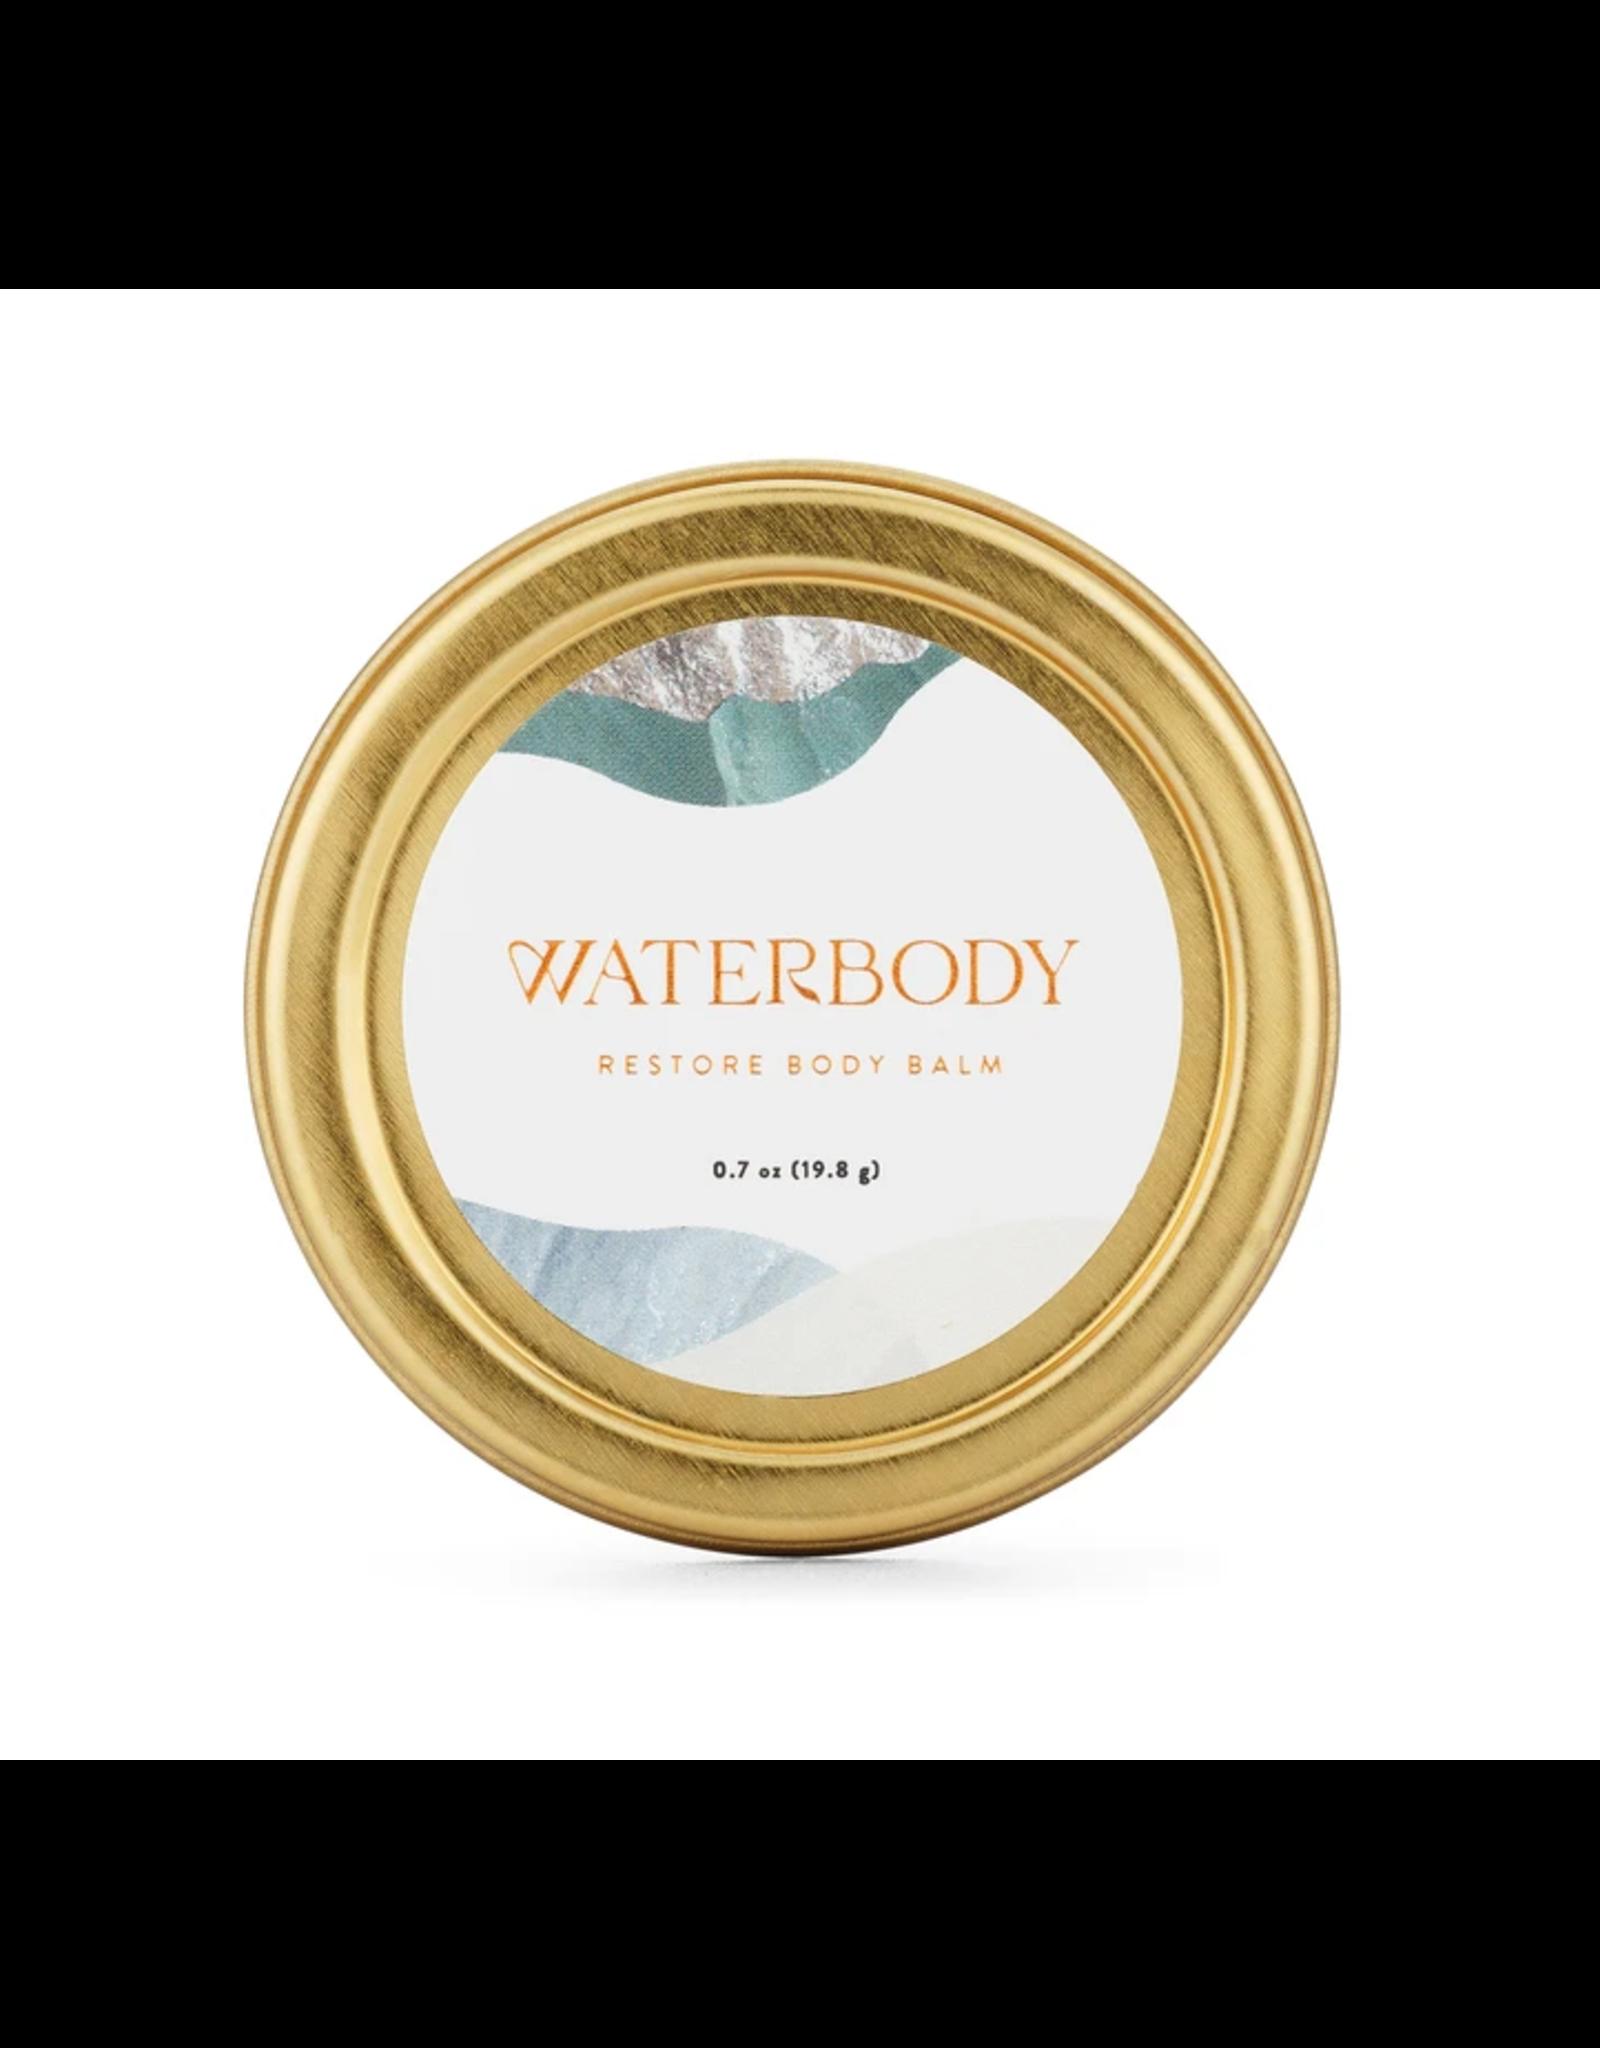 Waterbody Restore Body Balm | Waterbody